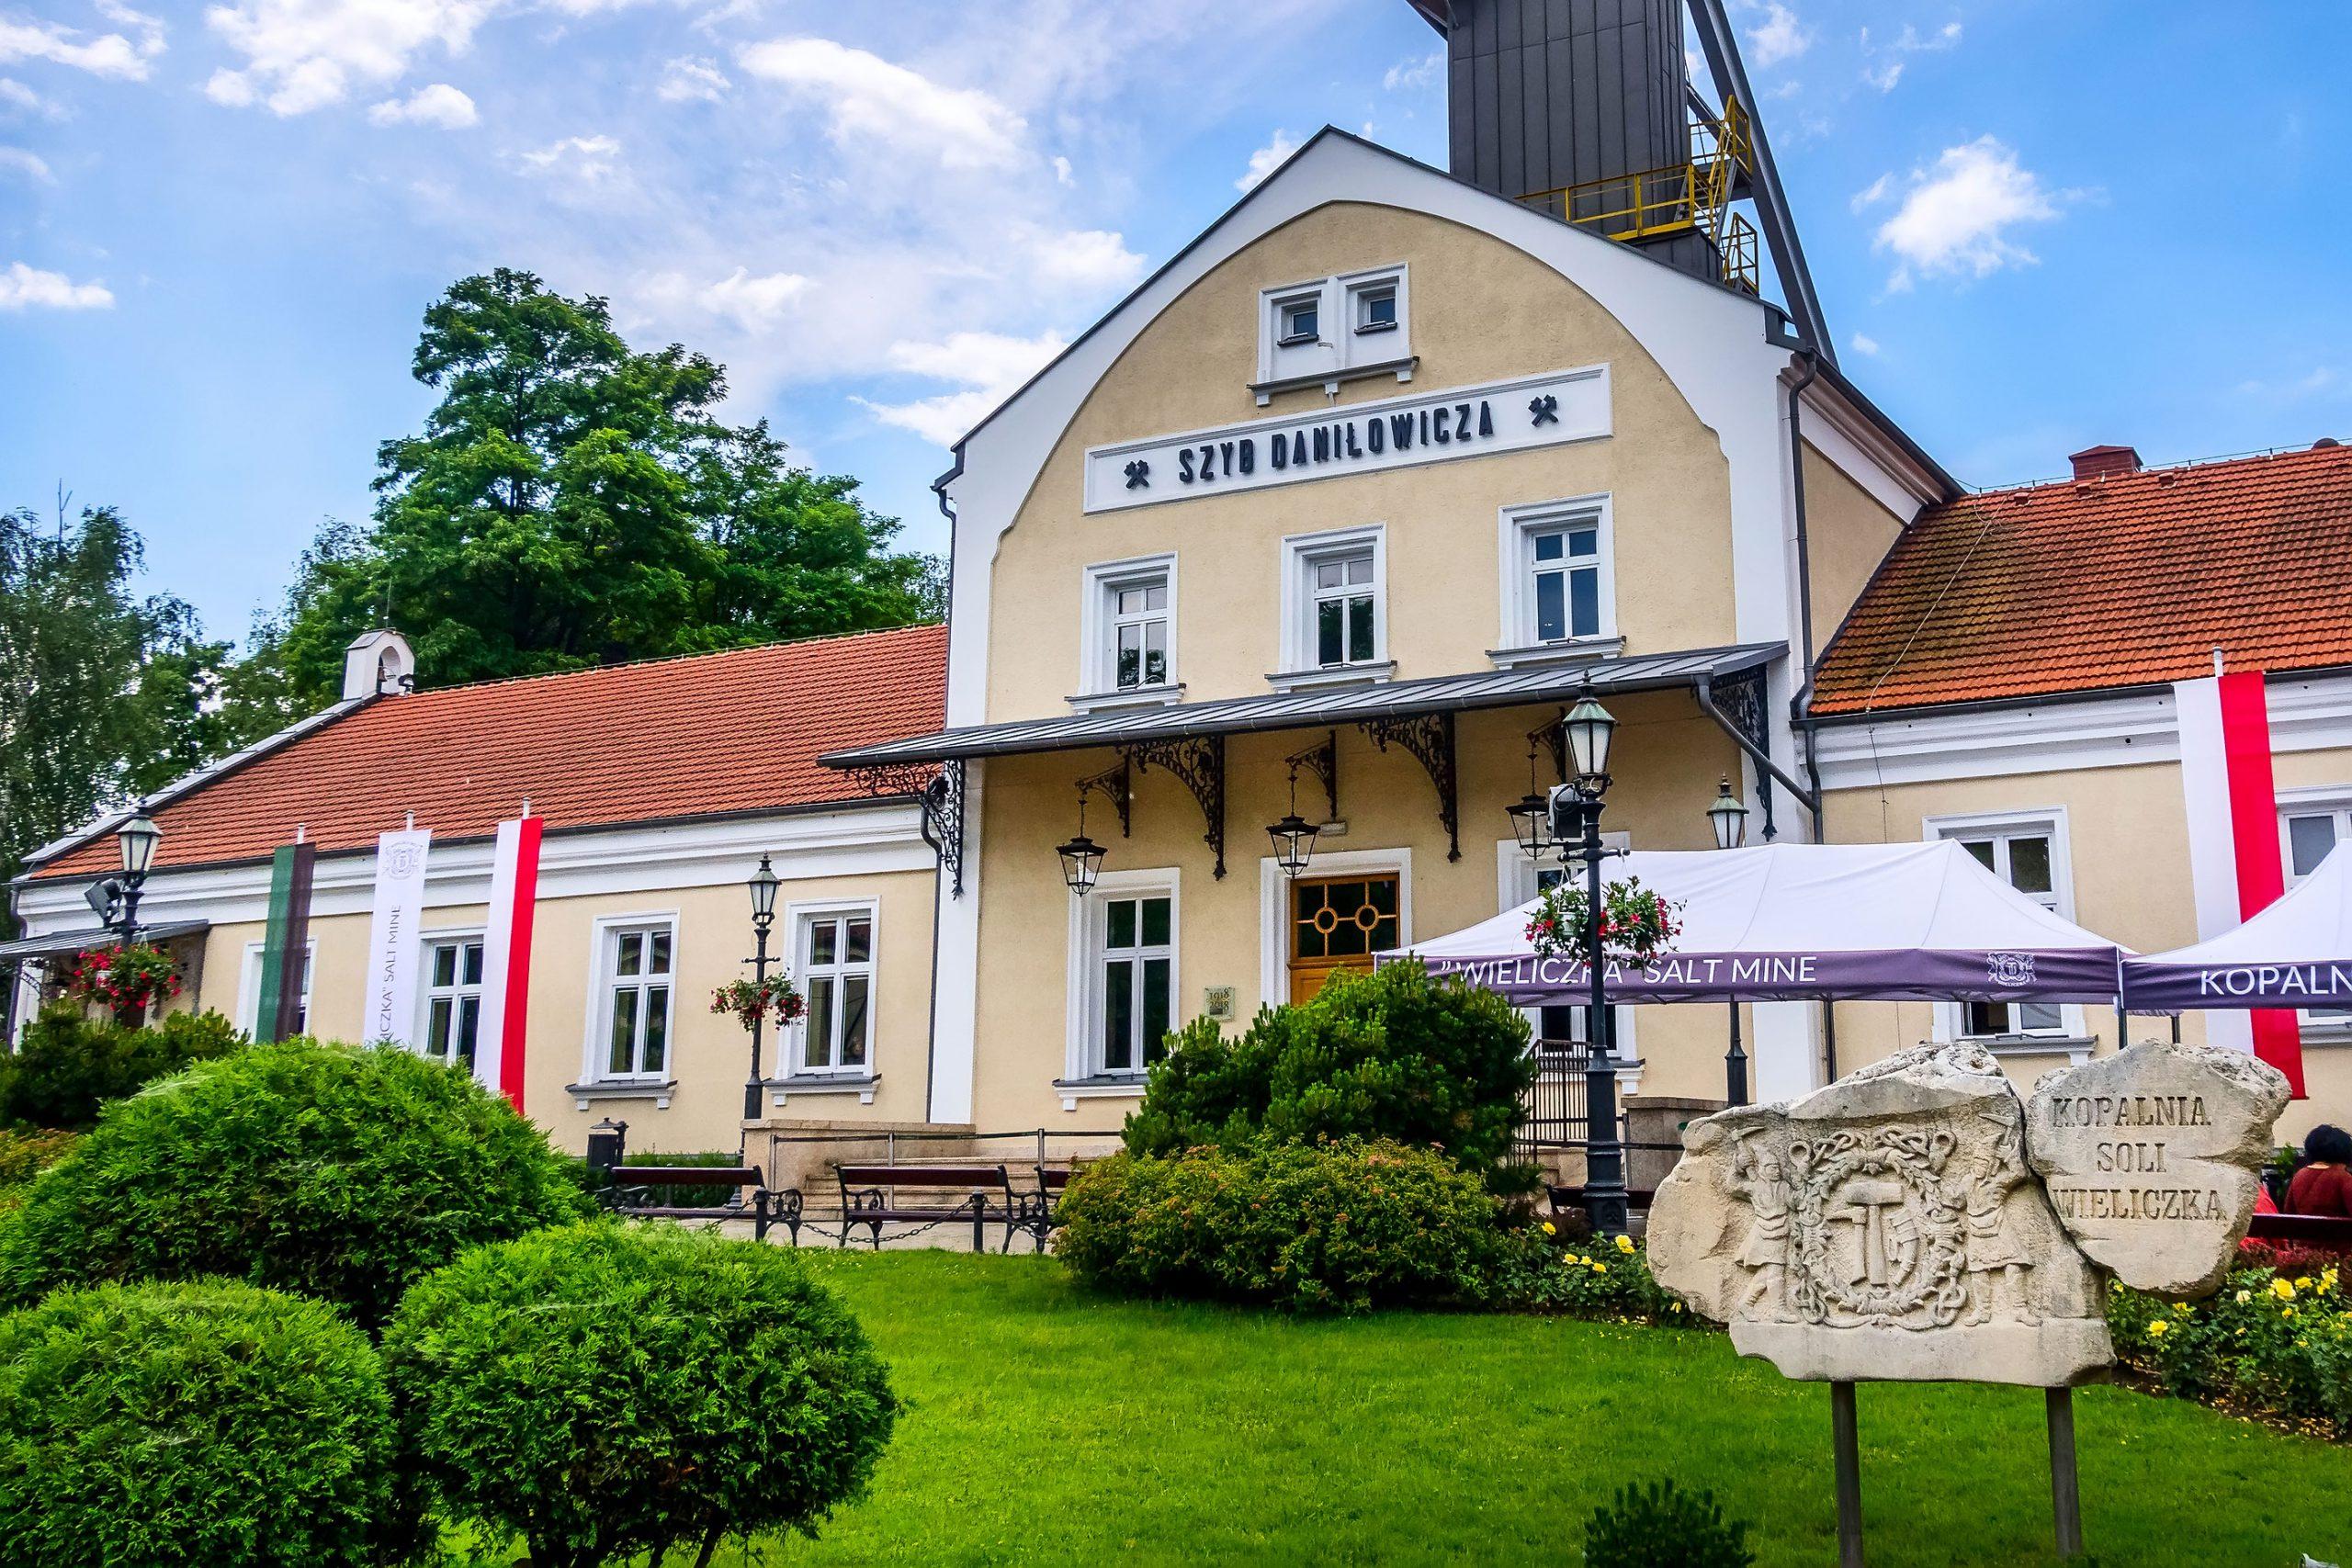 Wieliczka saltgruver Krakow